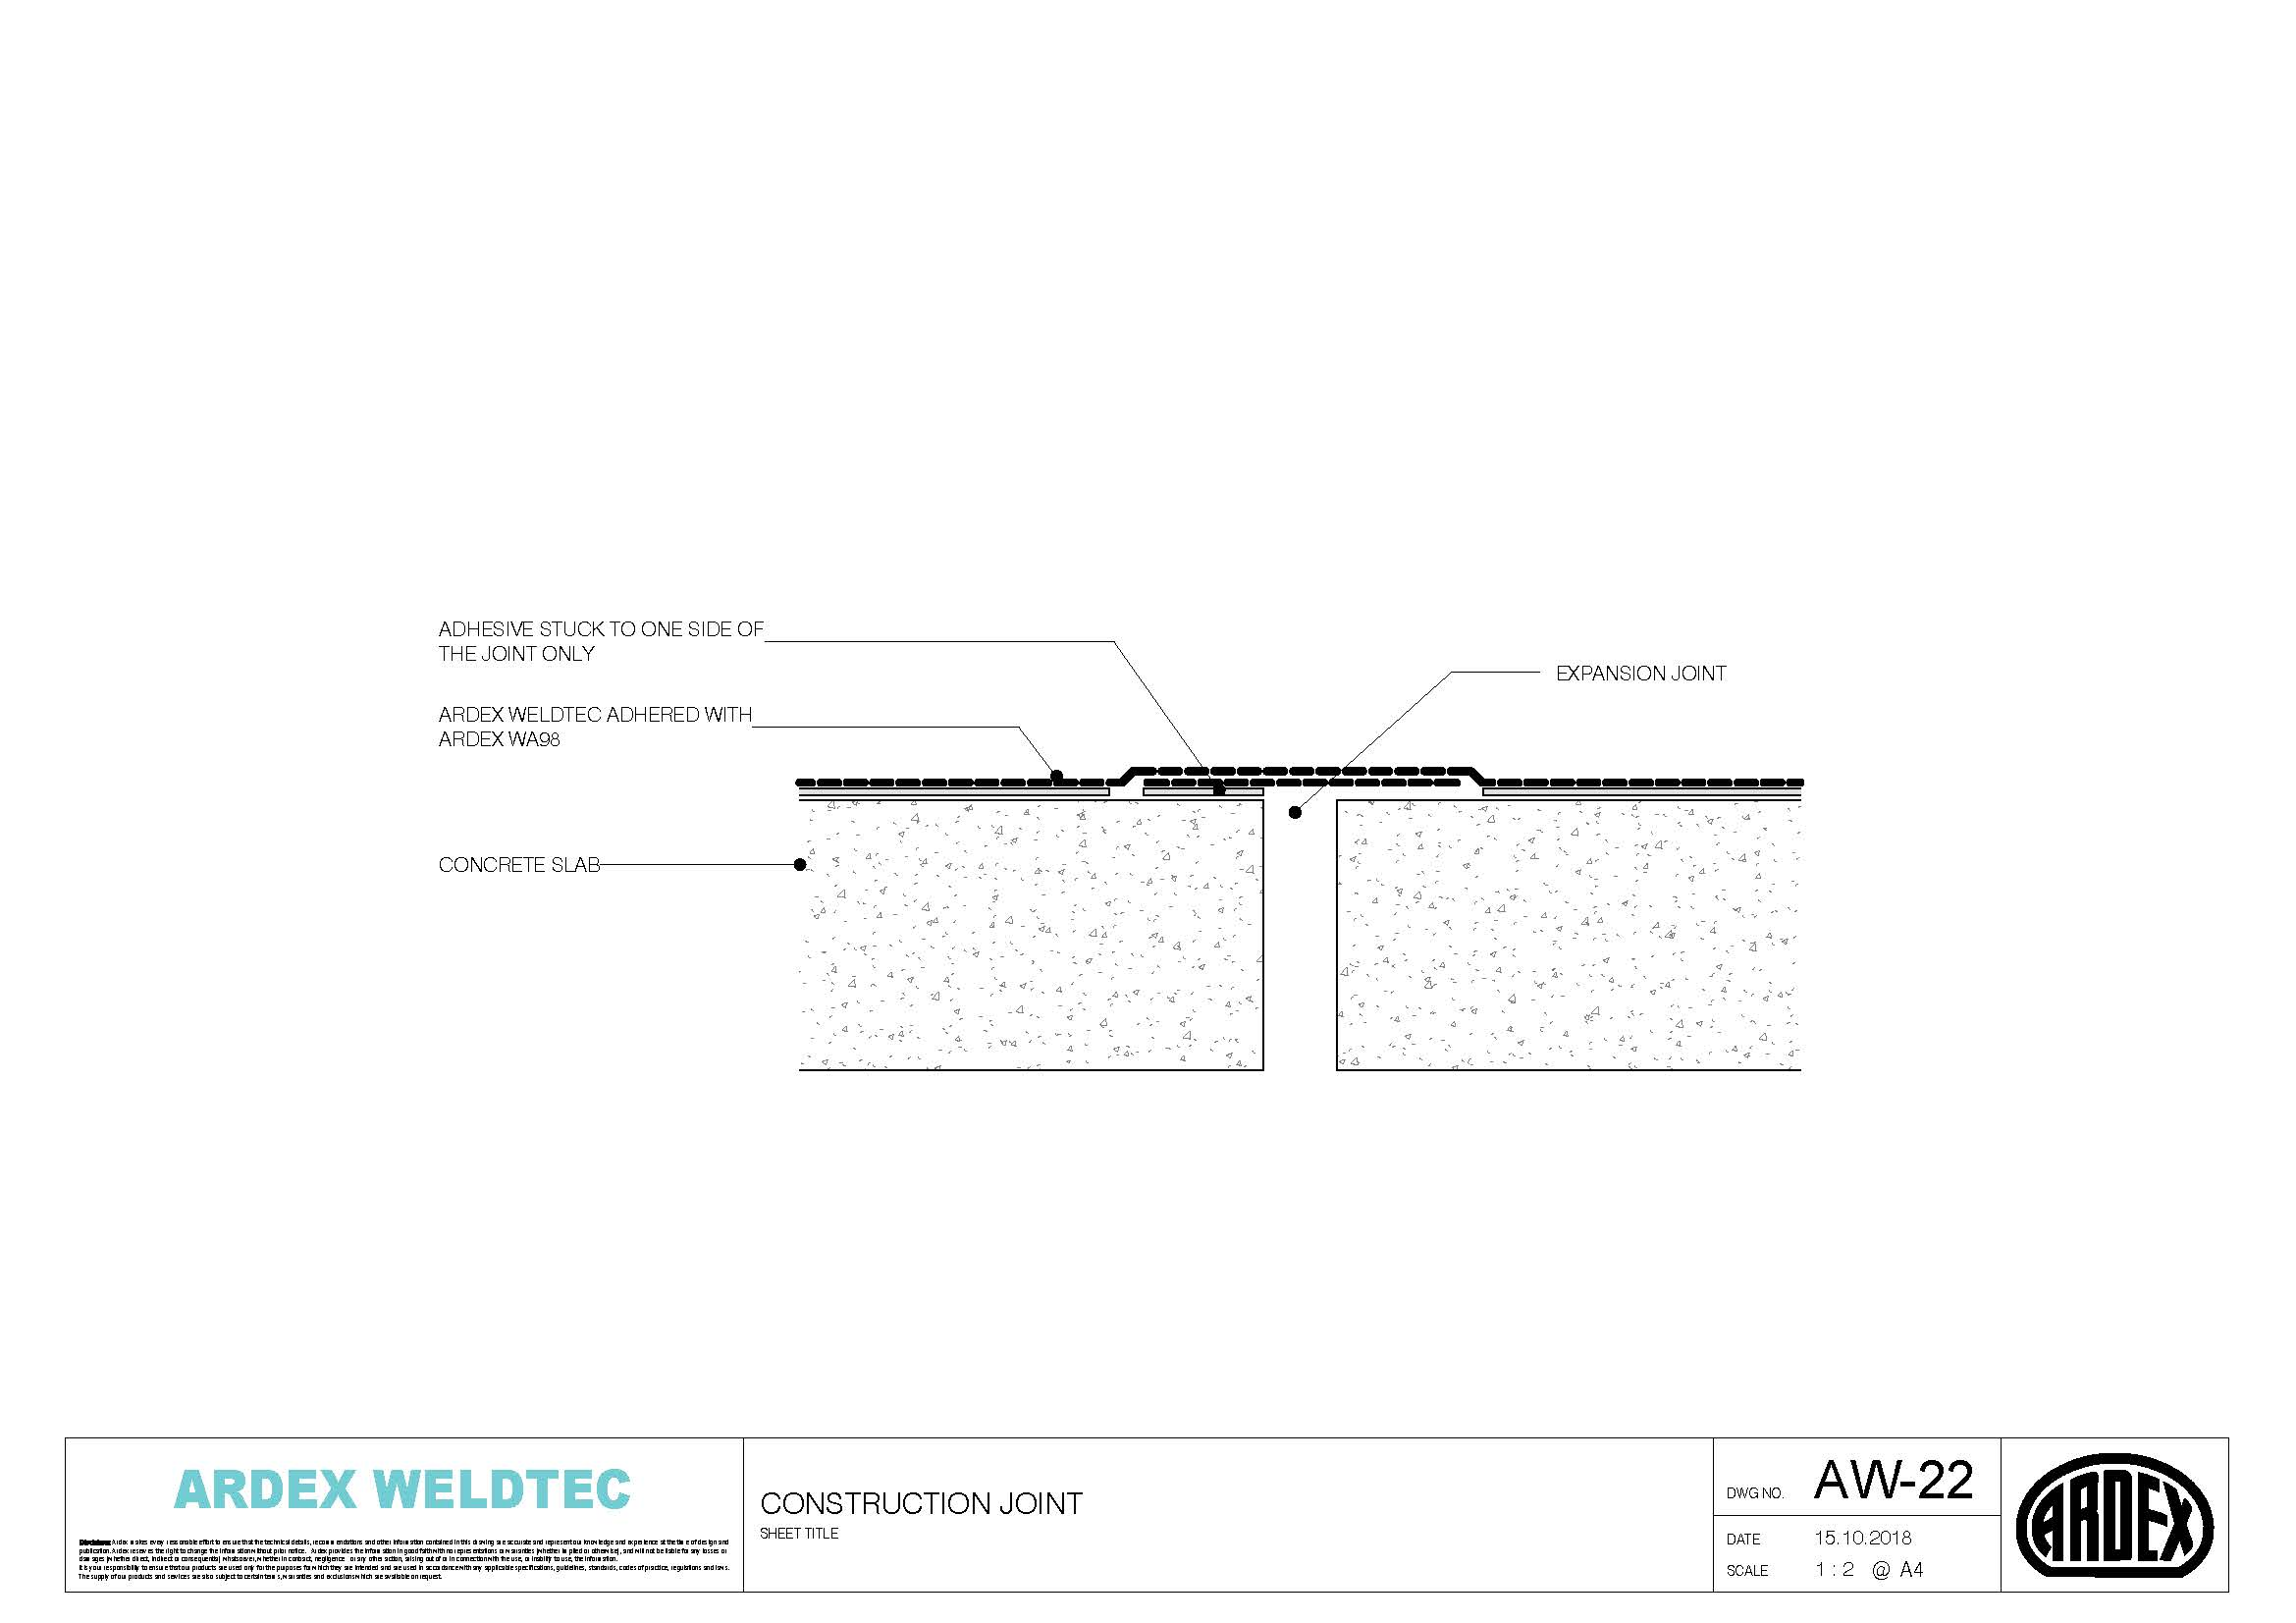 Weldtec construction joint